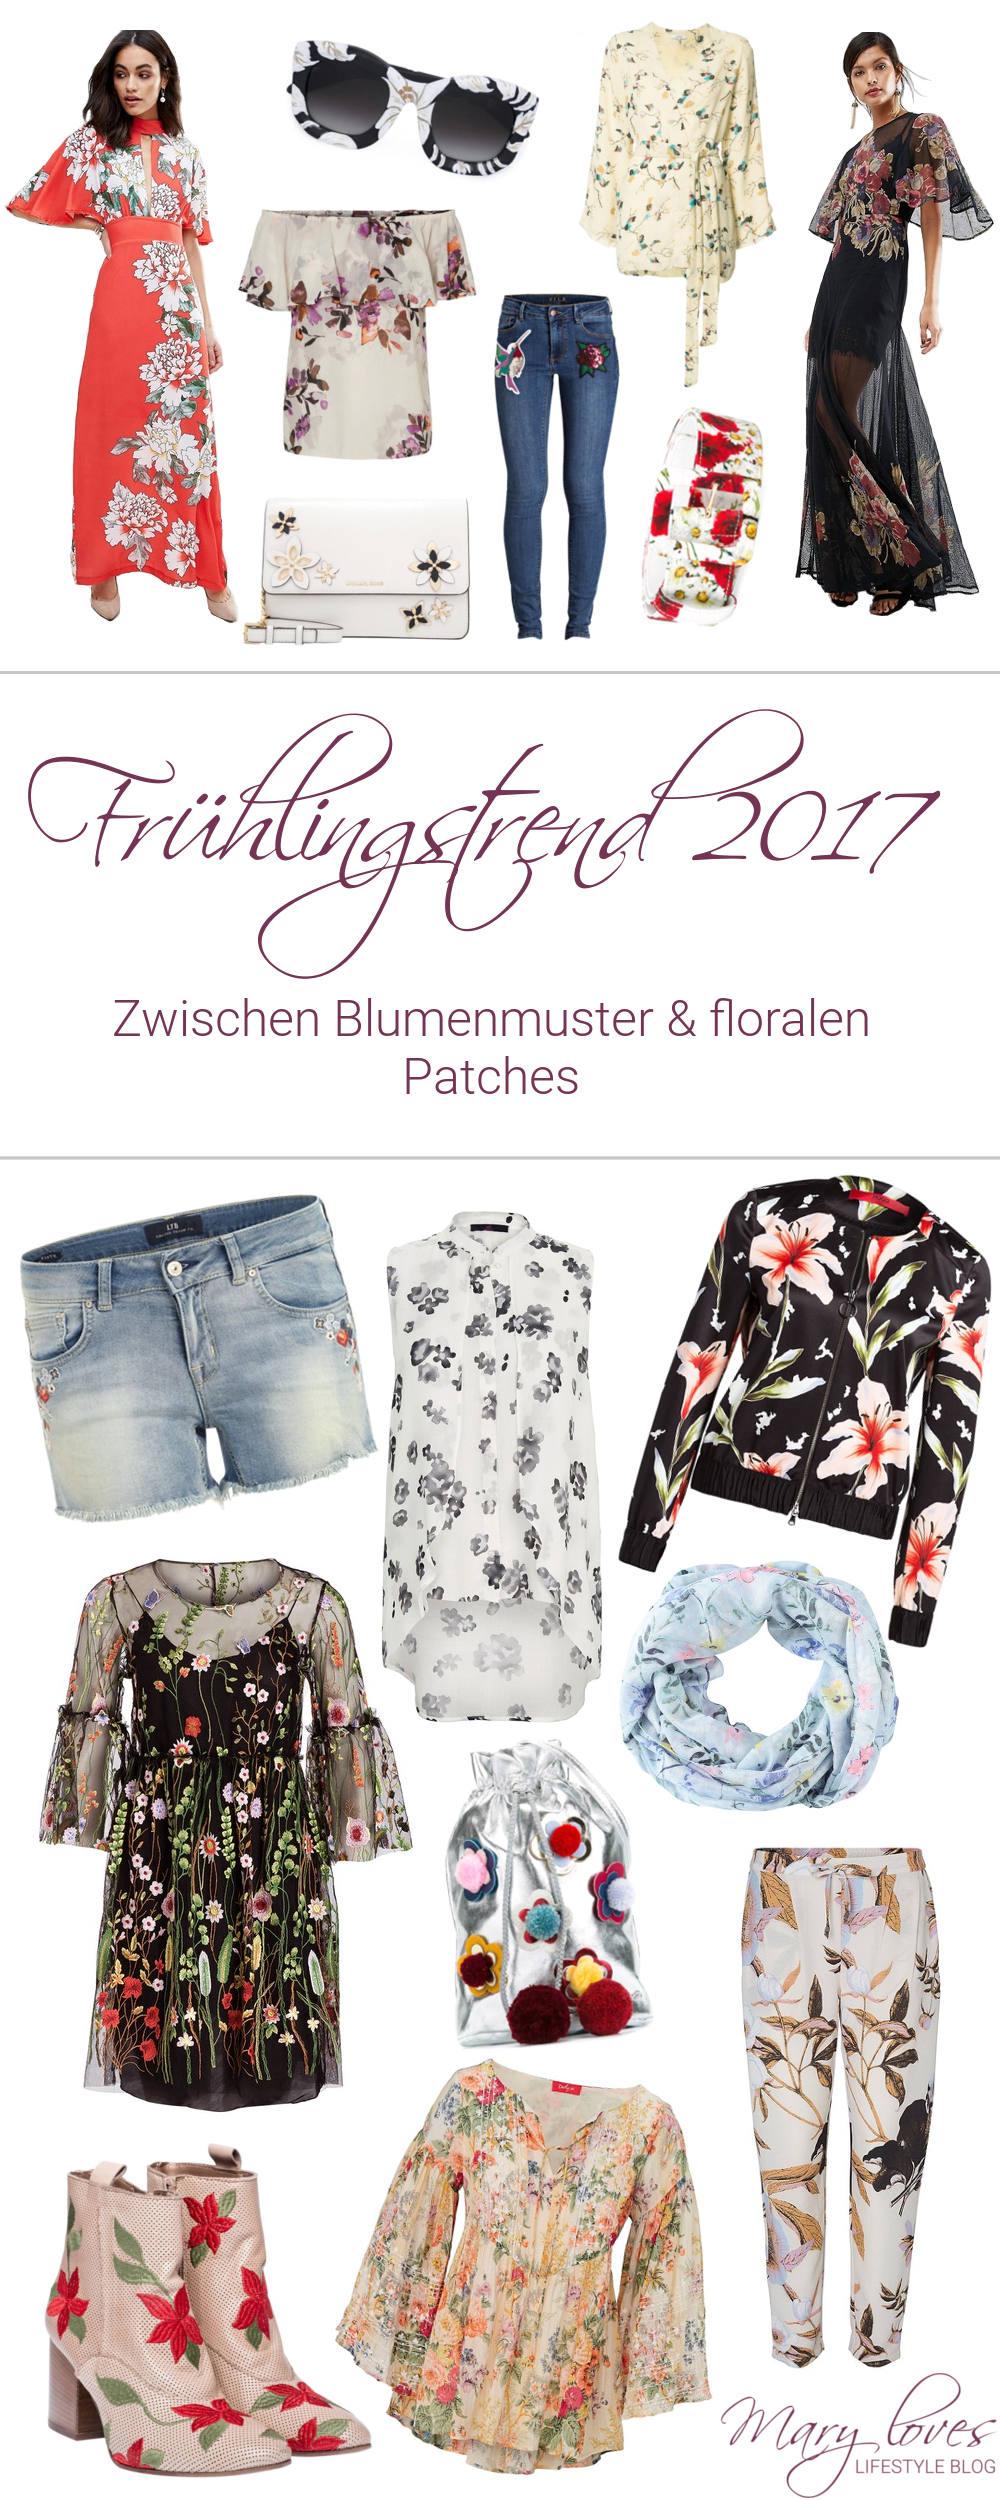 Editor's Picks - Frühlingstrend 2017 - Bunte Blumenmuster und florale Patches - Modetrend, Blumenprint, floral, Flowerprint, Flower Power, Fashion, Outfit, Inspirationen